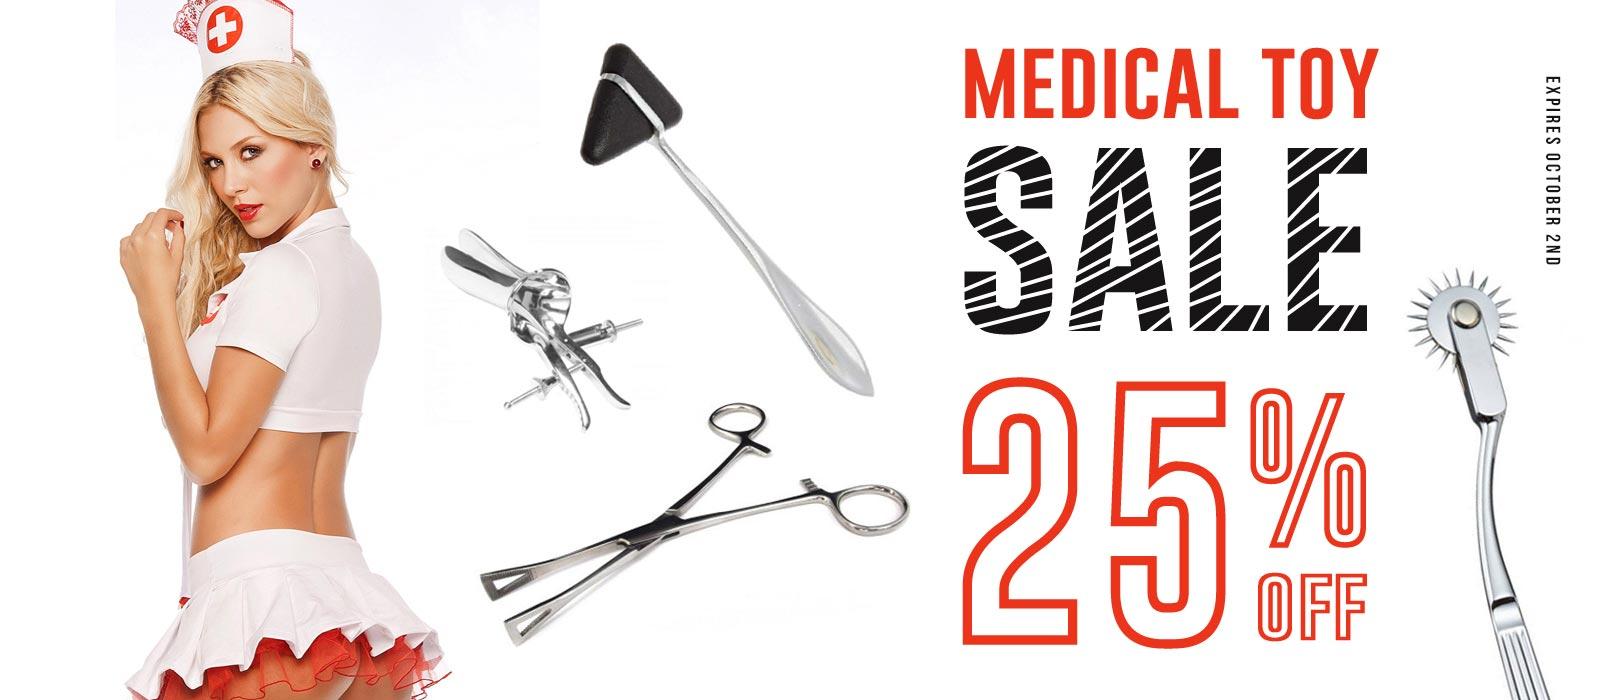 medical toy sale